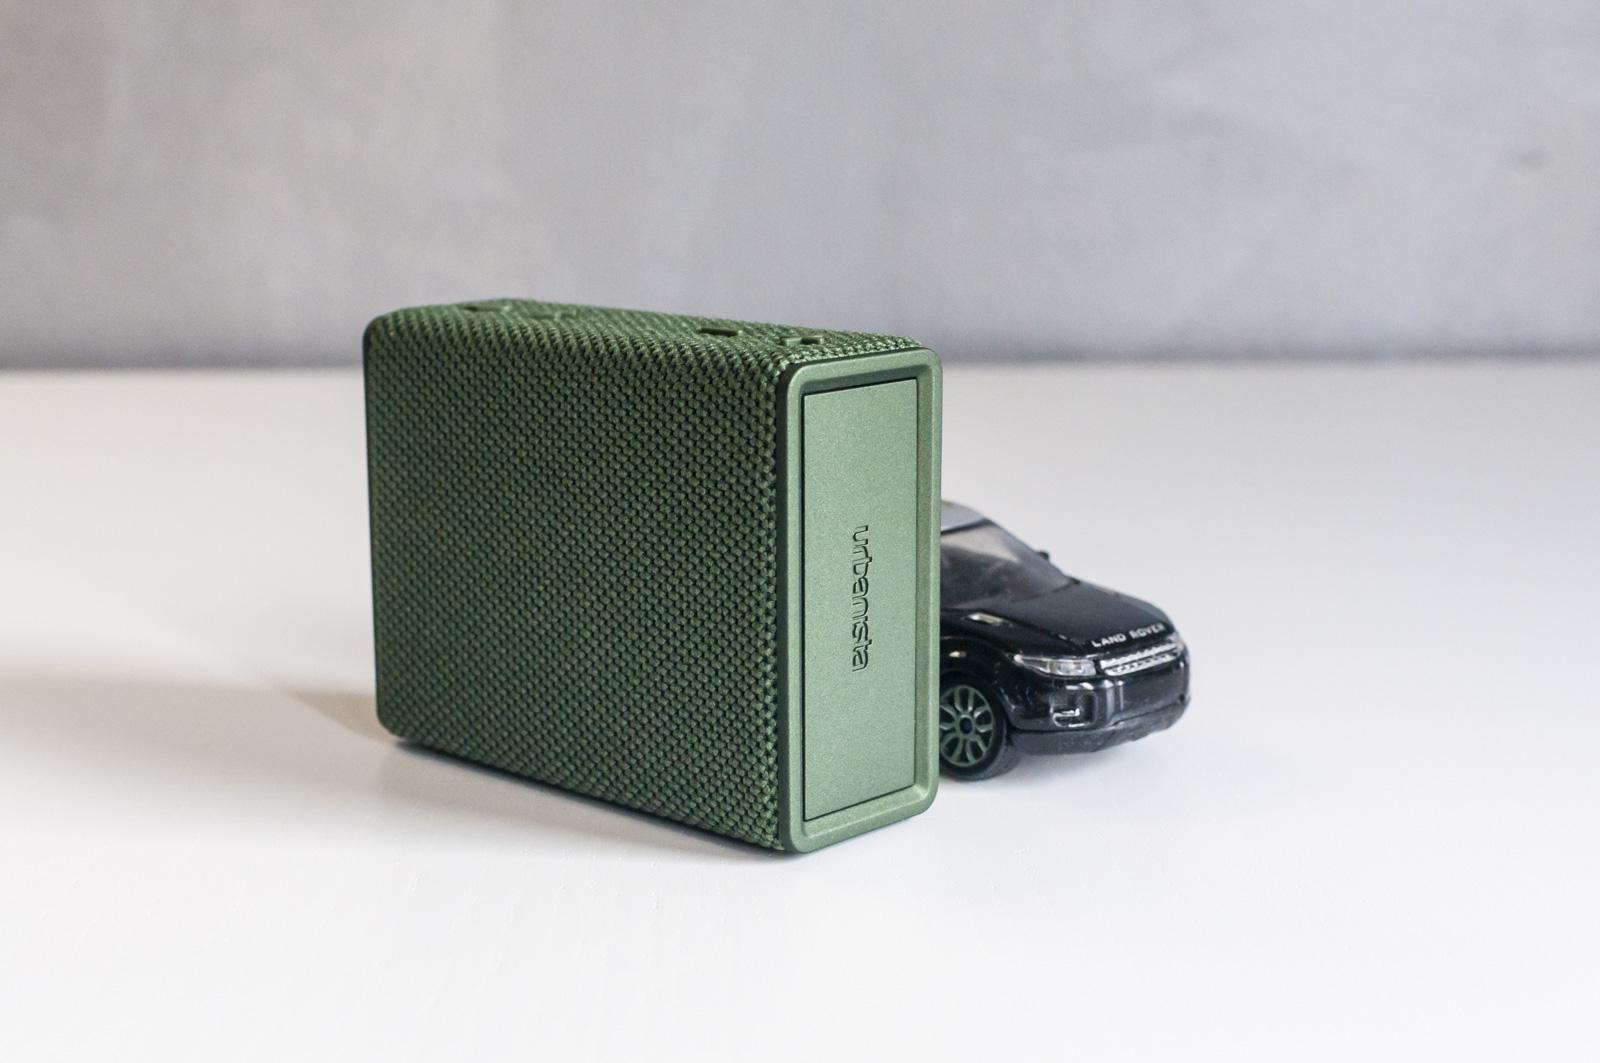 Recensione Urbanista Sydney, l'R2-D2 degli speaker Bluetooth